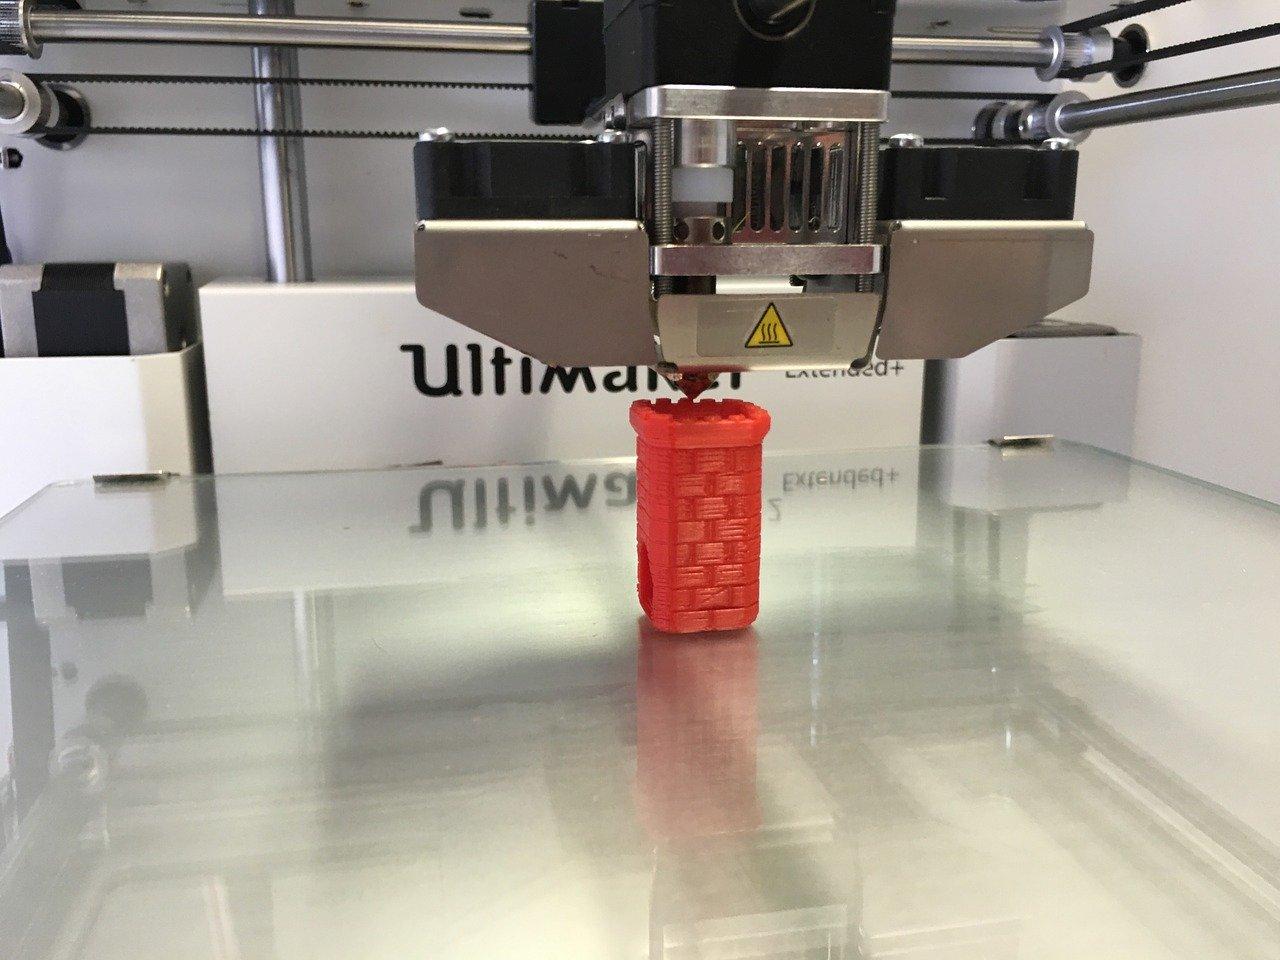 Ultimaker printer